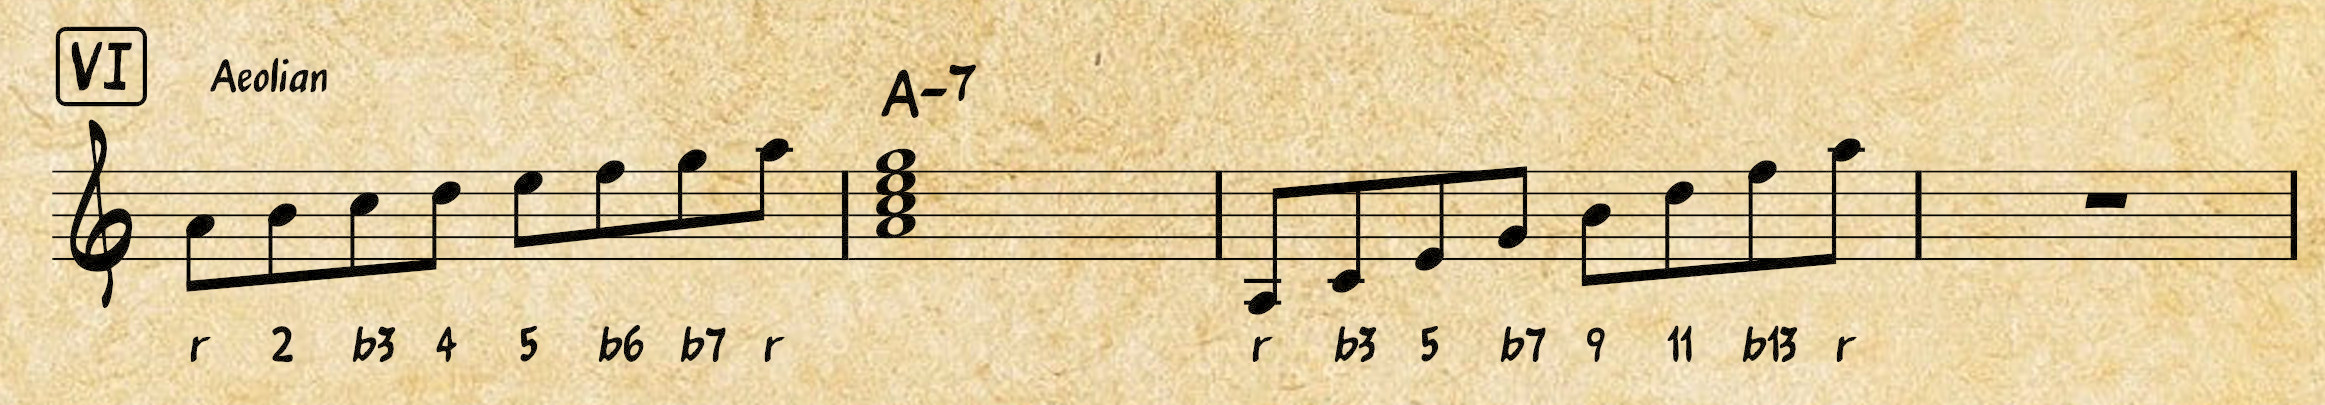 Western Music Theory: Aeolian